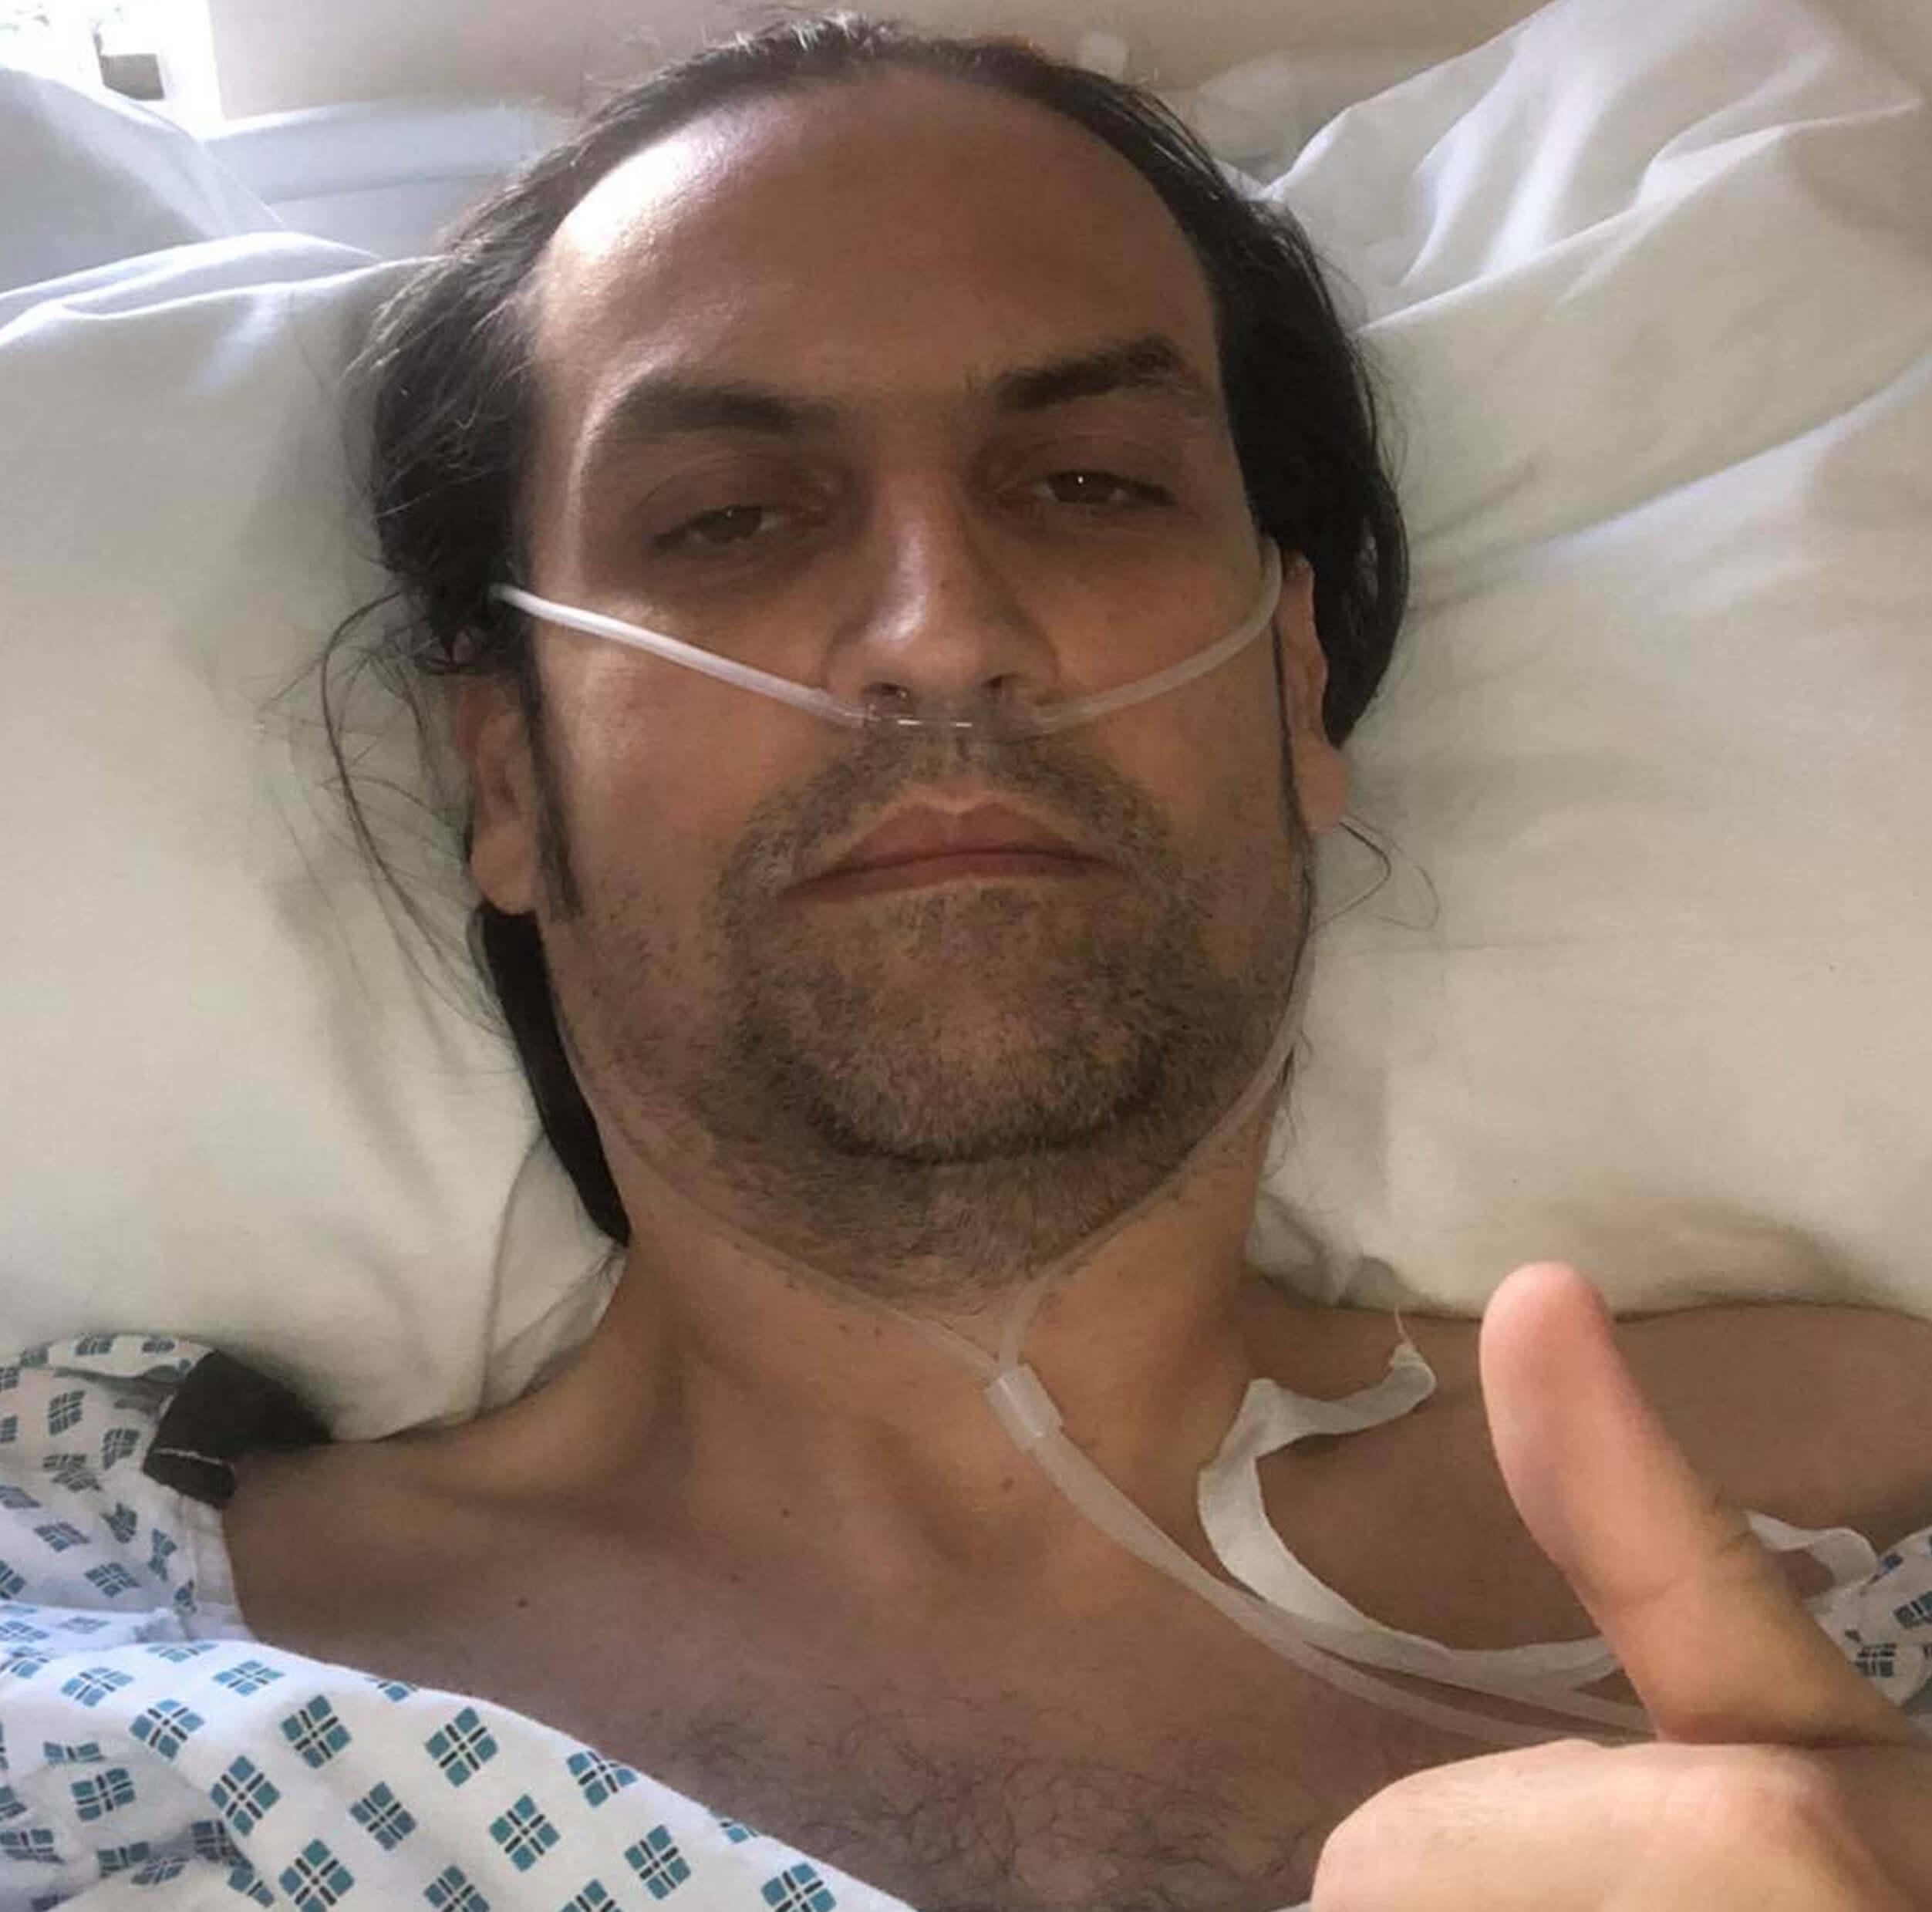 Dave Ferguson needing emergency surgery for appendicitis